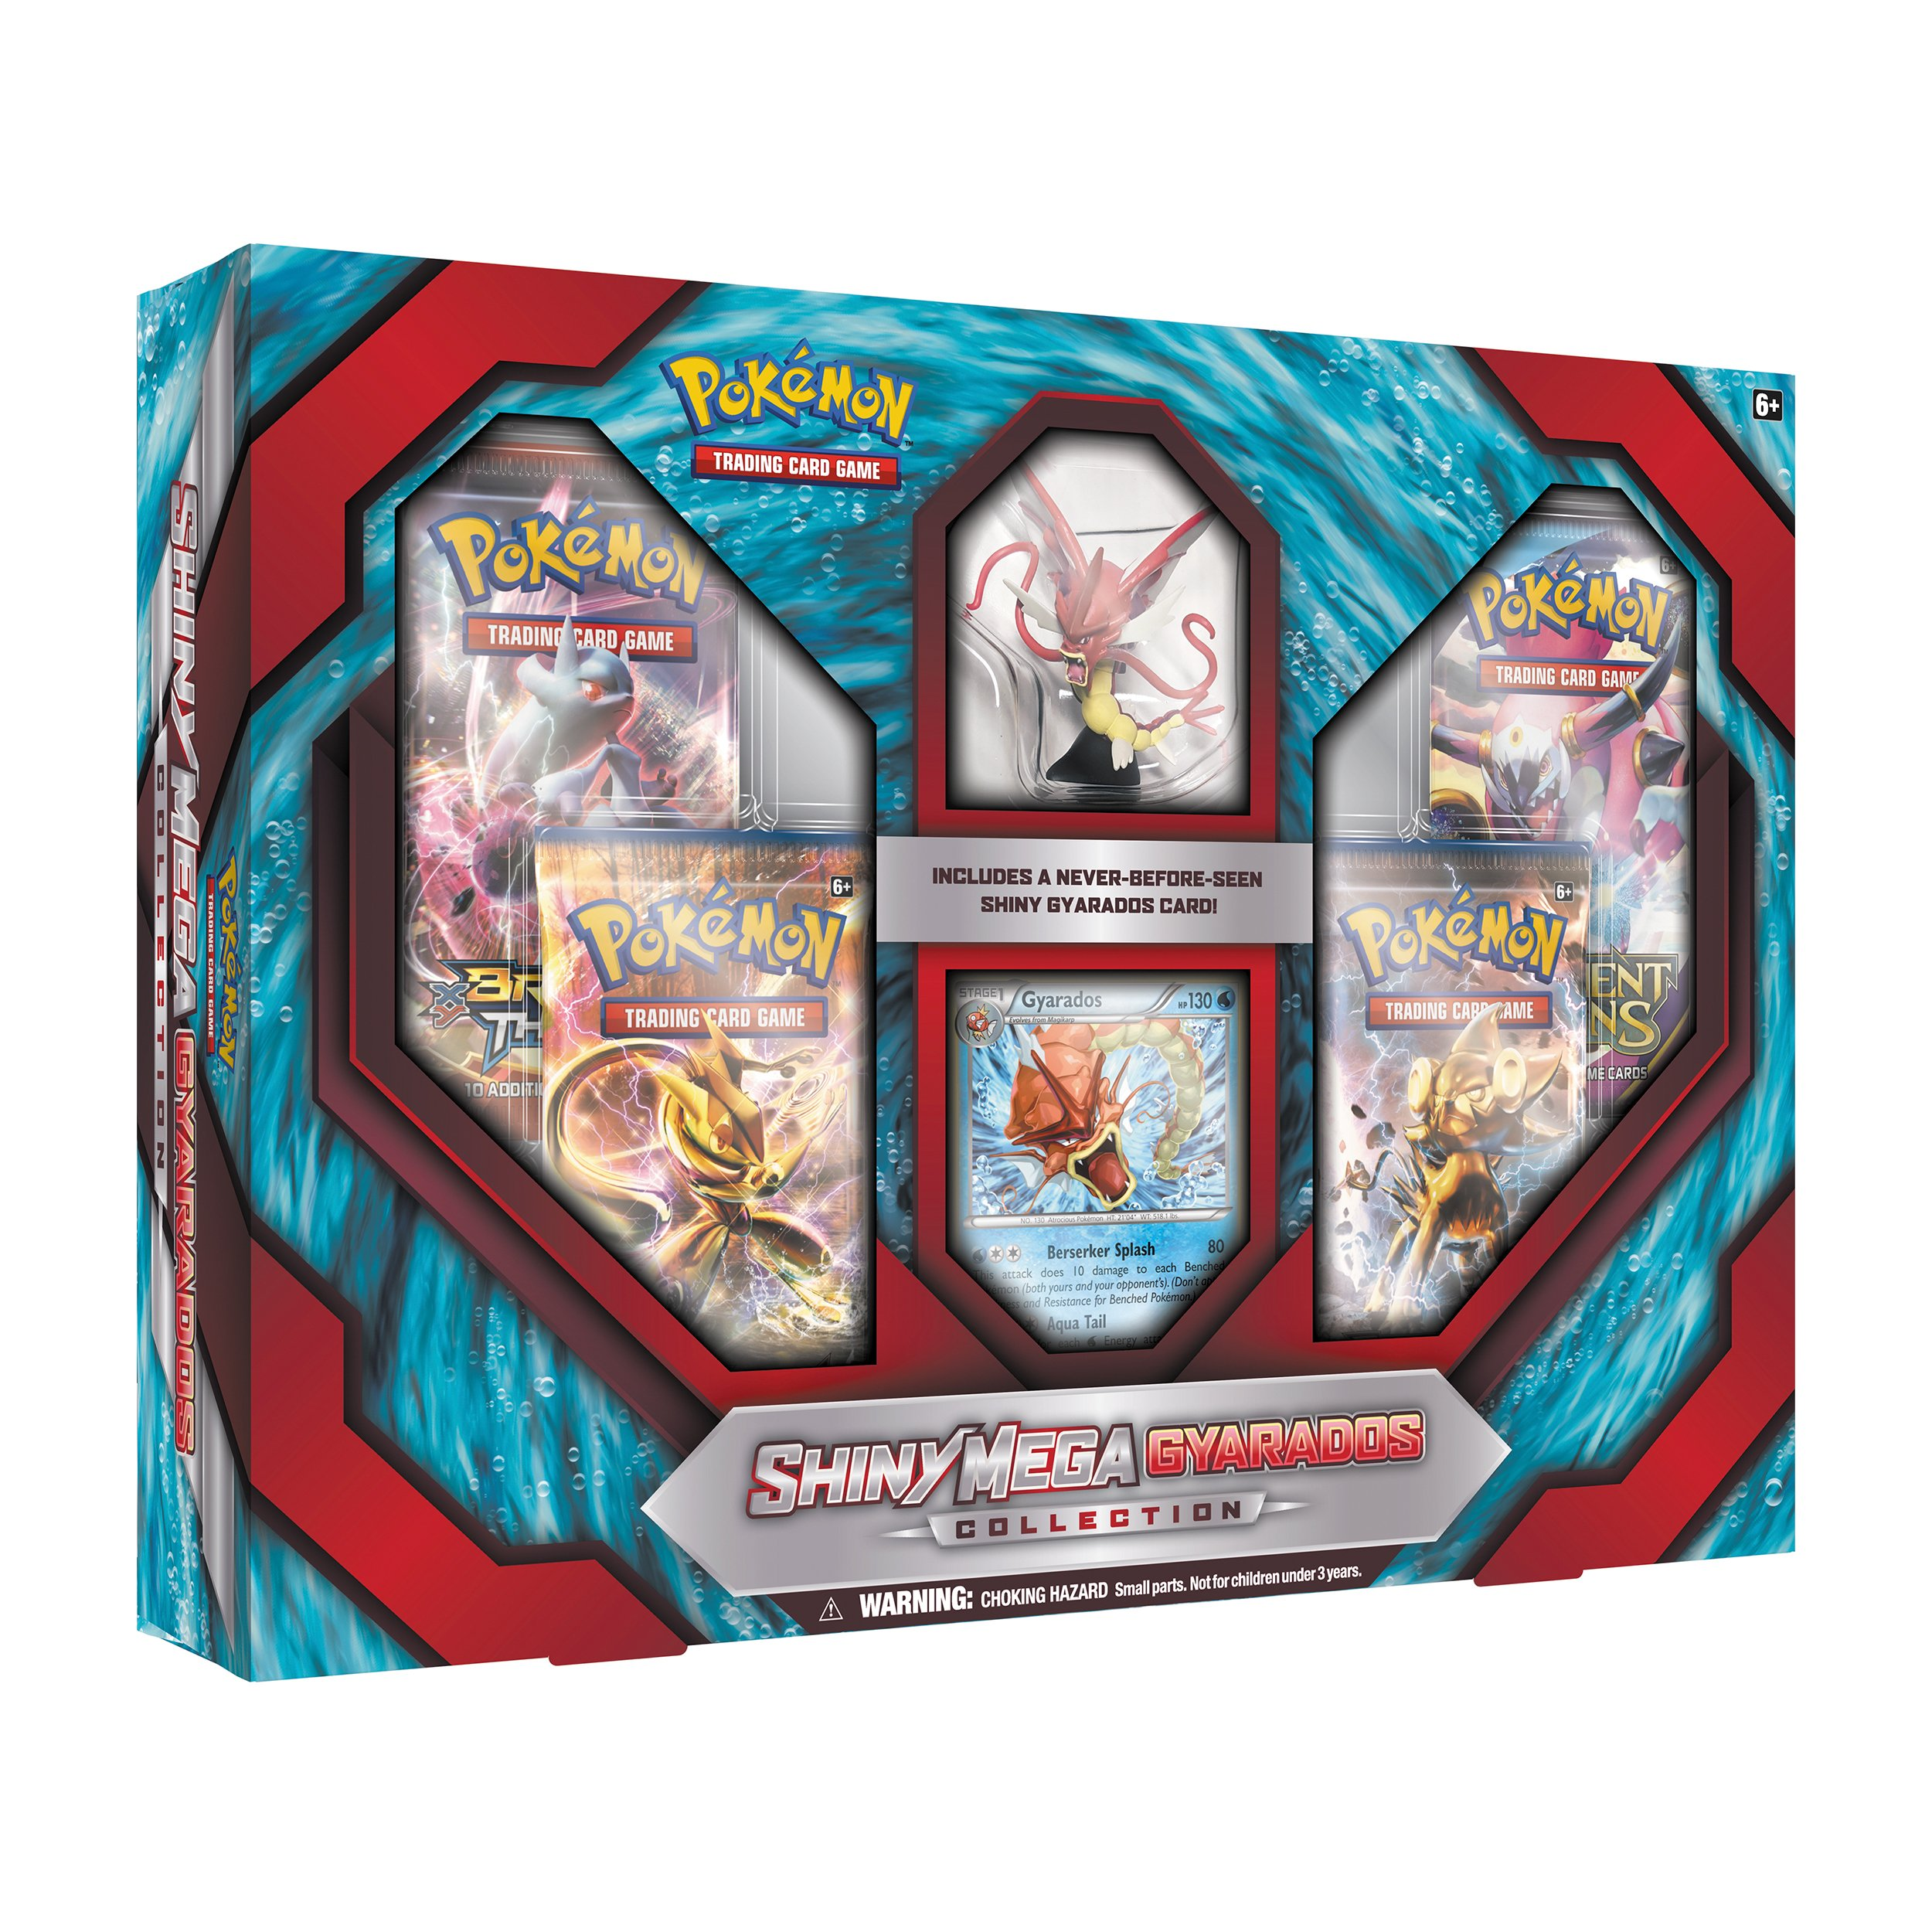 Pokemon Shiny Mega Gyarados Collection Box